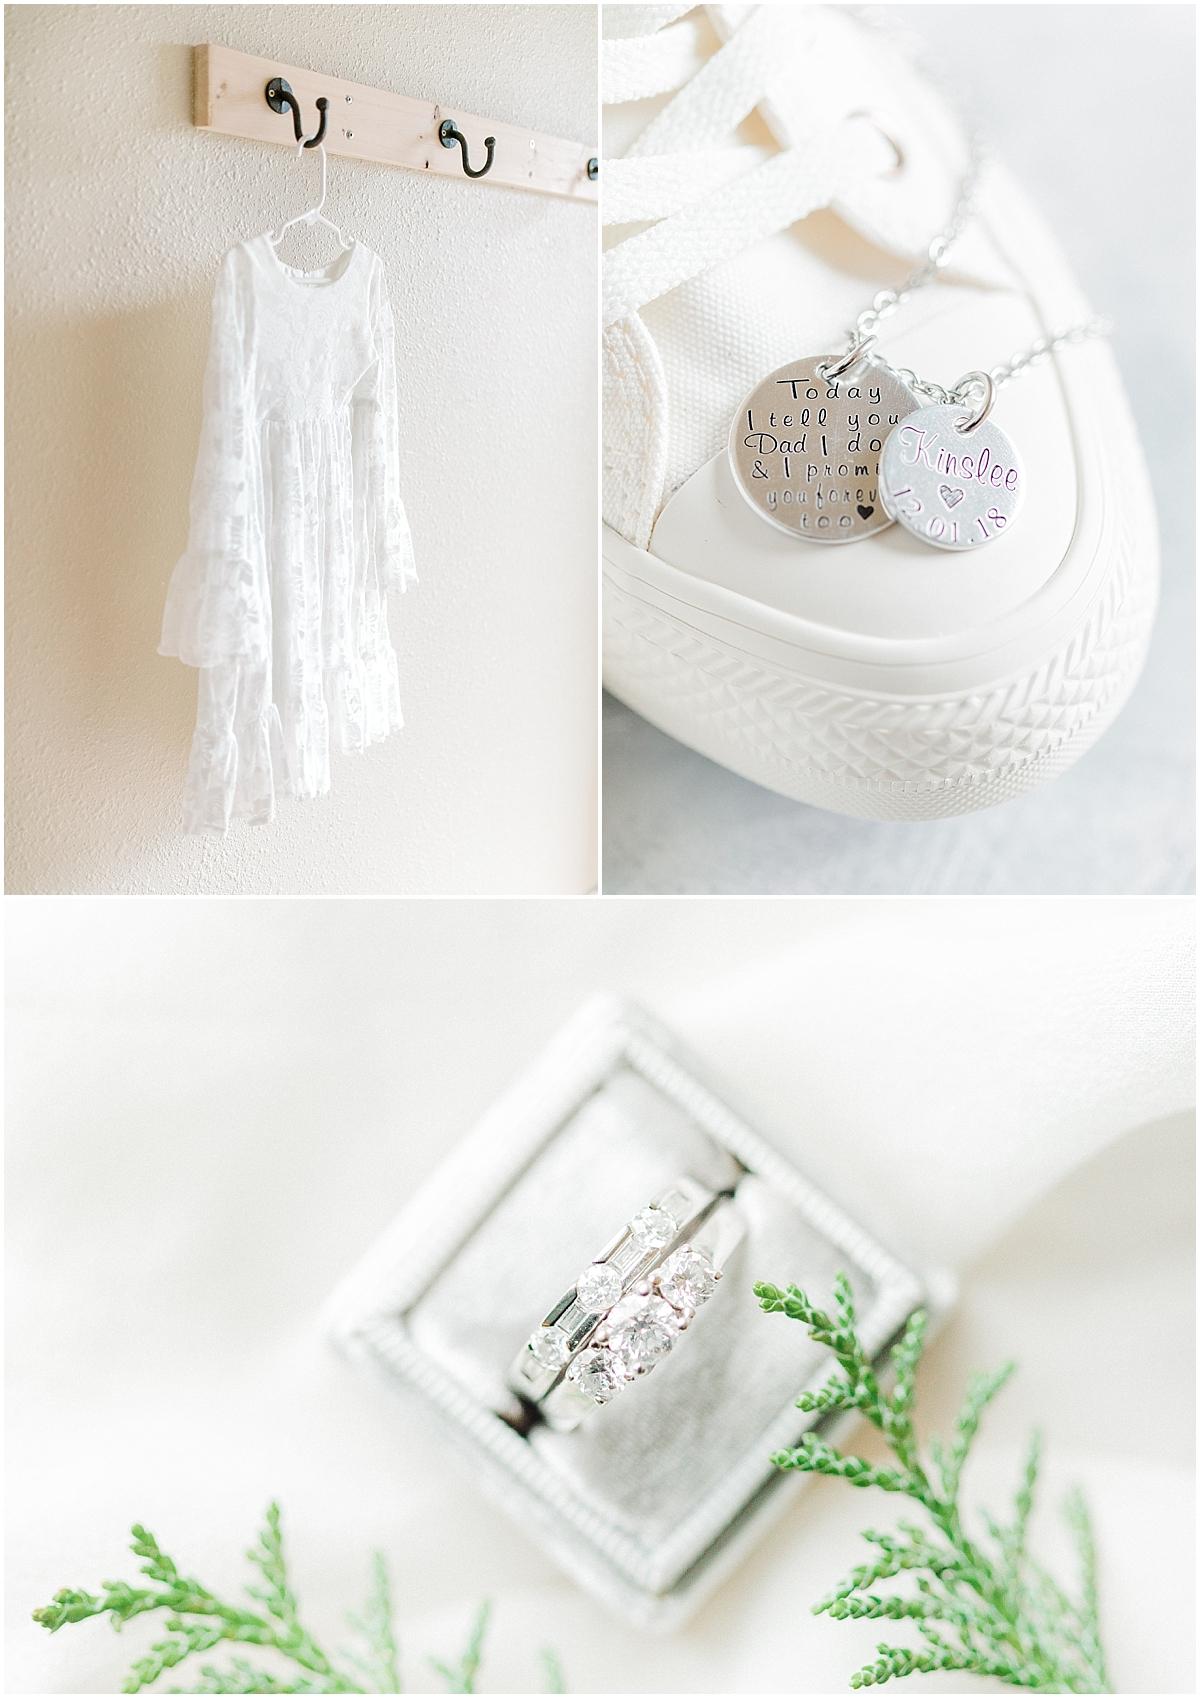 Chehalis Washington Winter Wedding Silver and White | Willapa Hills Farm Wedding | Eastham | Emma Rose Company PNW Light and Airy Wedding Photographer_0007.jpg